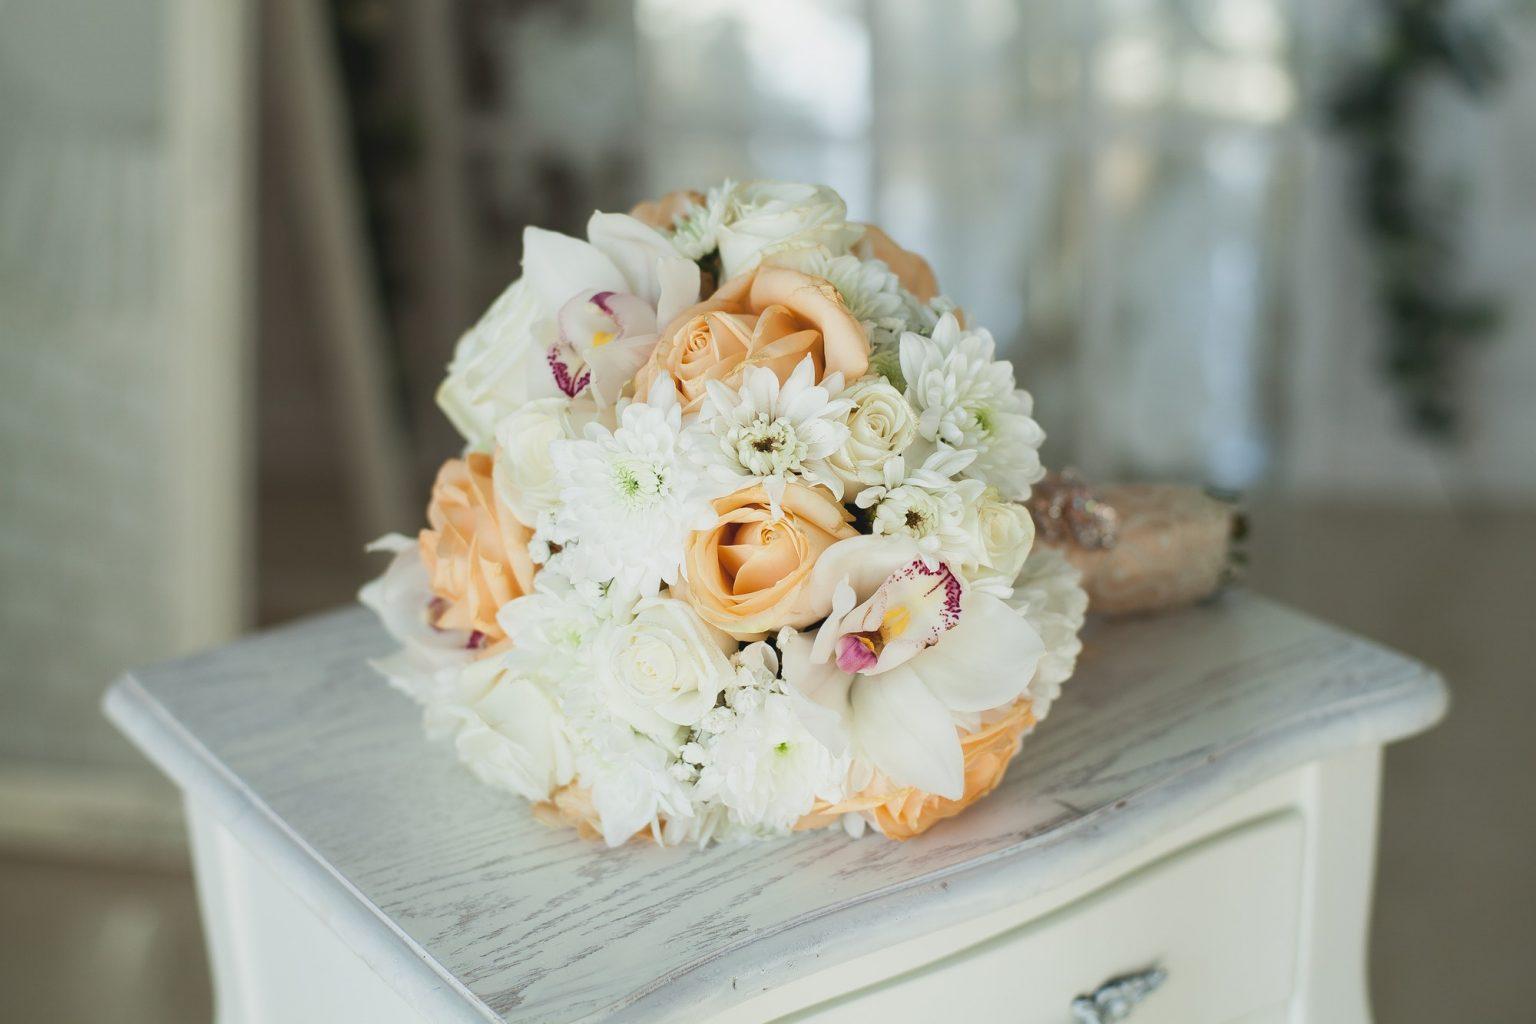 Wedding decor. Colored wedding bouquet on white background